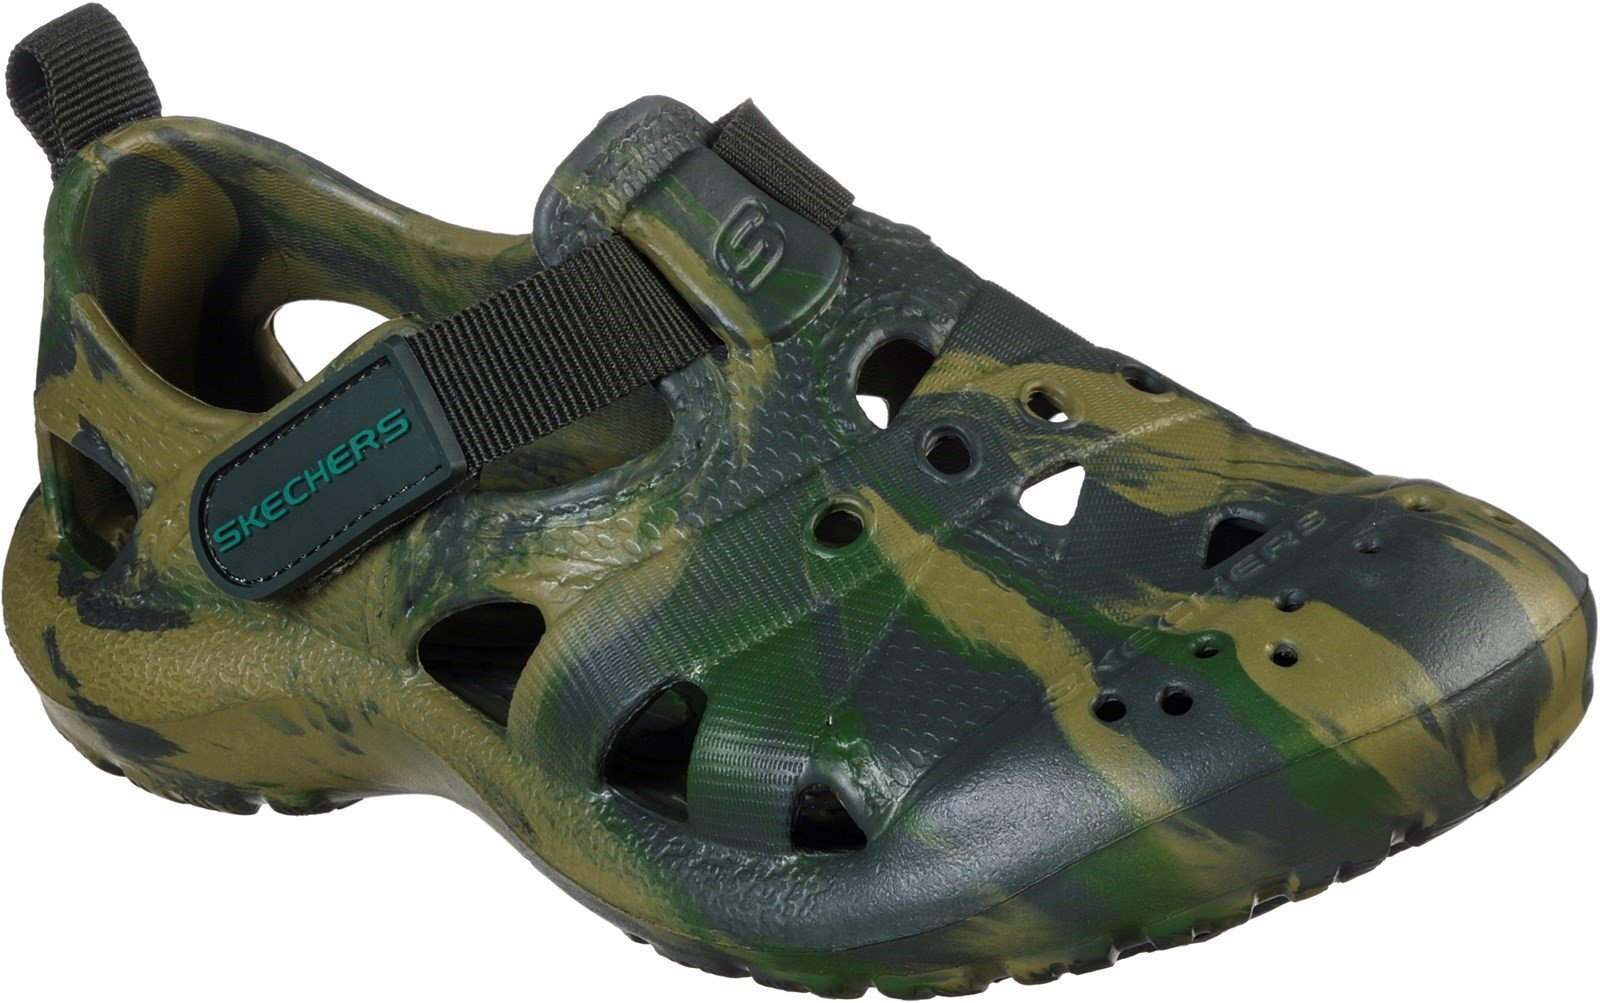 Skechers Unisex Foamies Koolers Sandal Camo 30785 - Camo 9.5